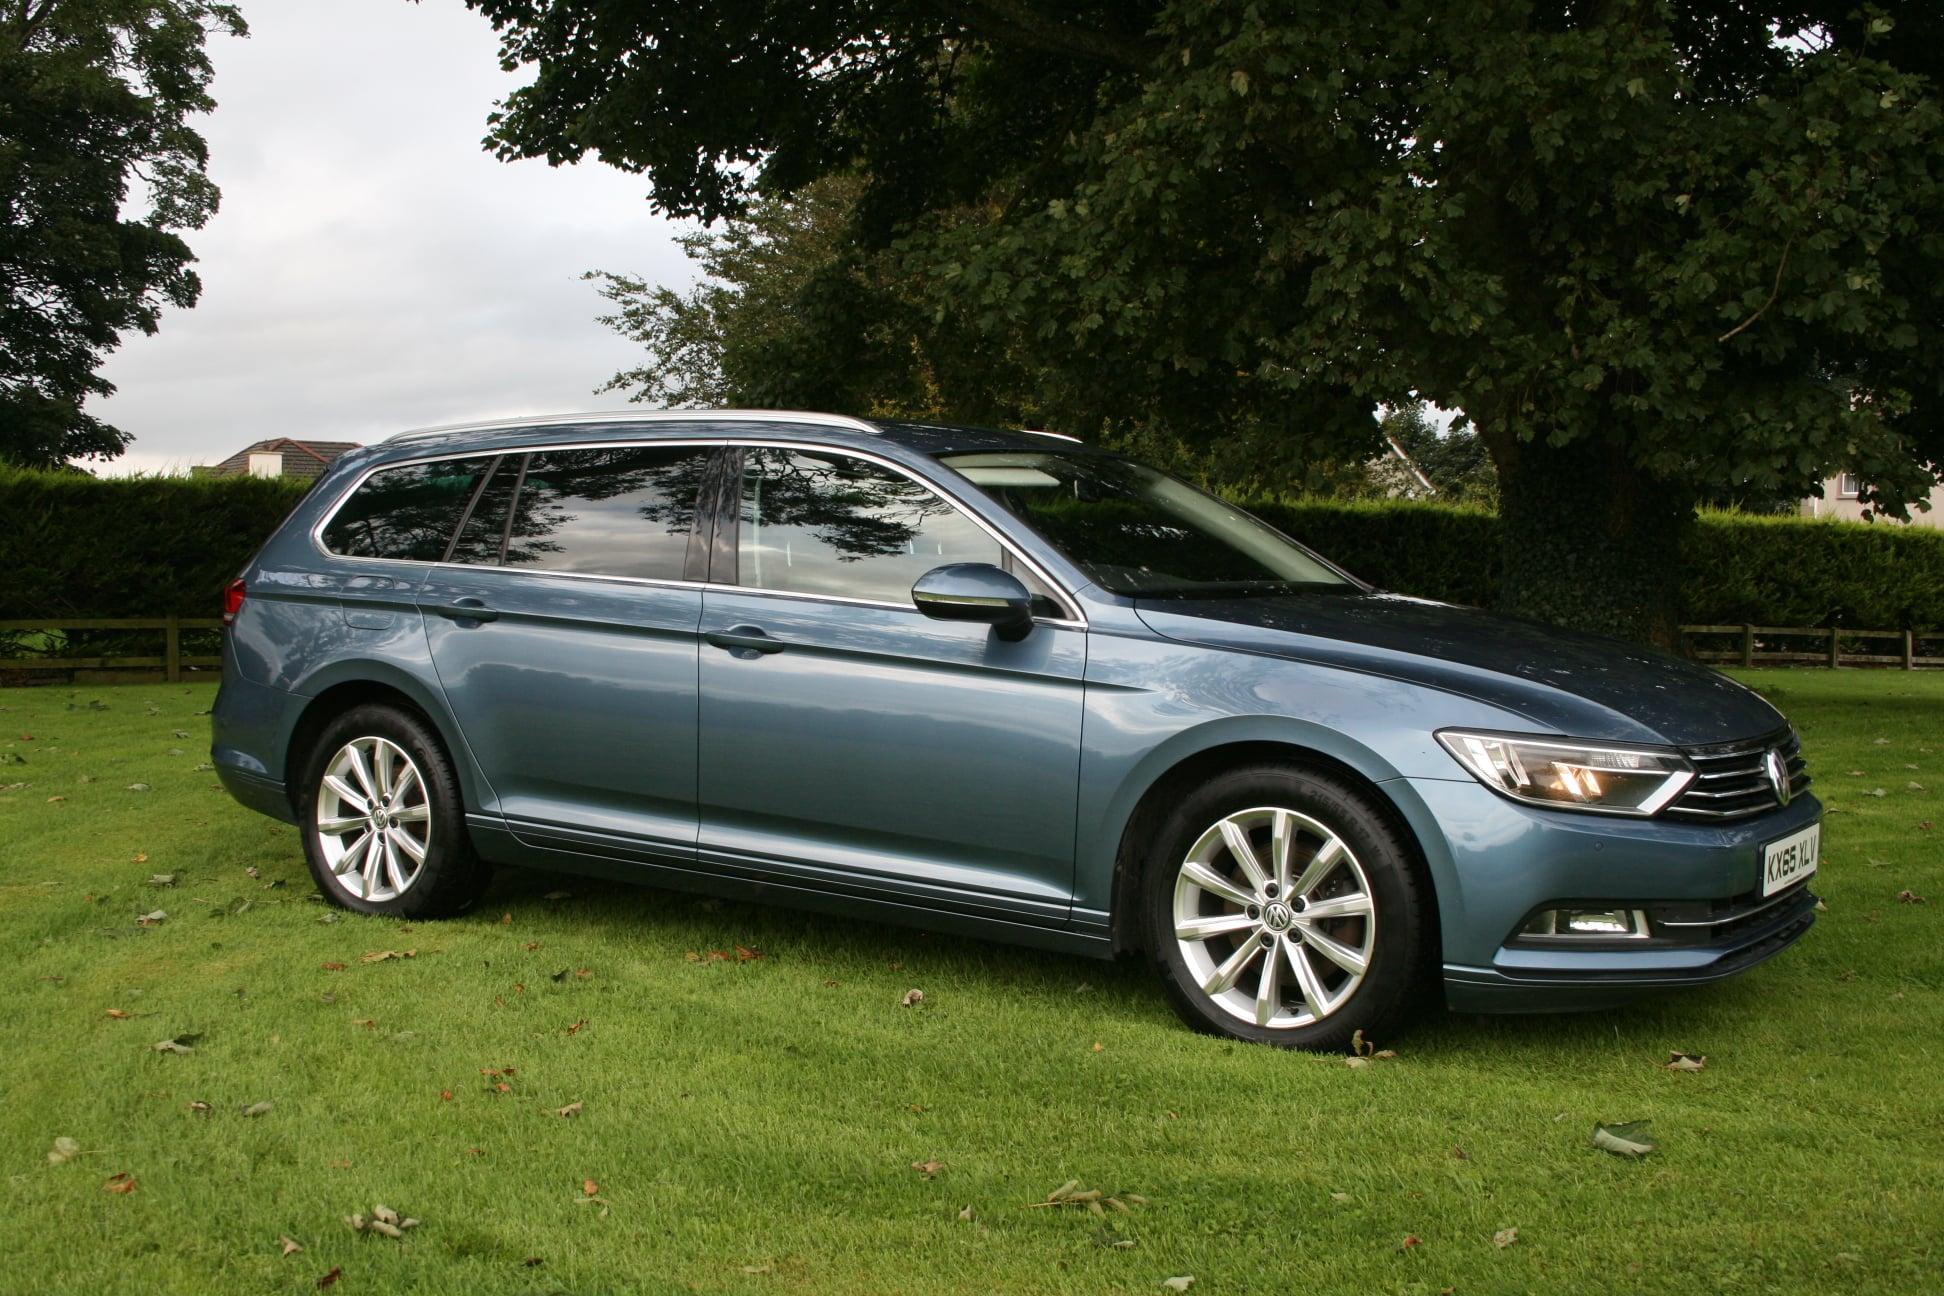 2015 Vw Passat 2 0 Tdi Se Business Estate Wj Mclaughlin Car Sales North West Ireland